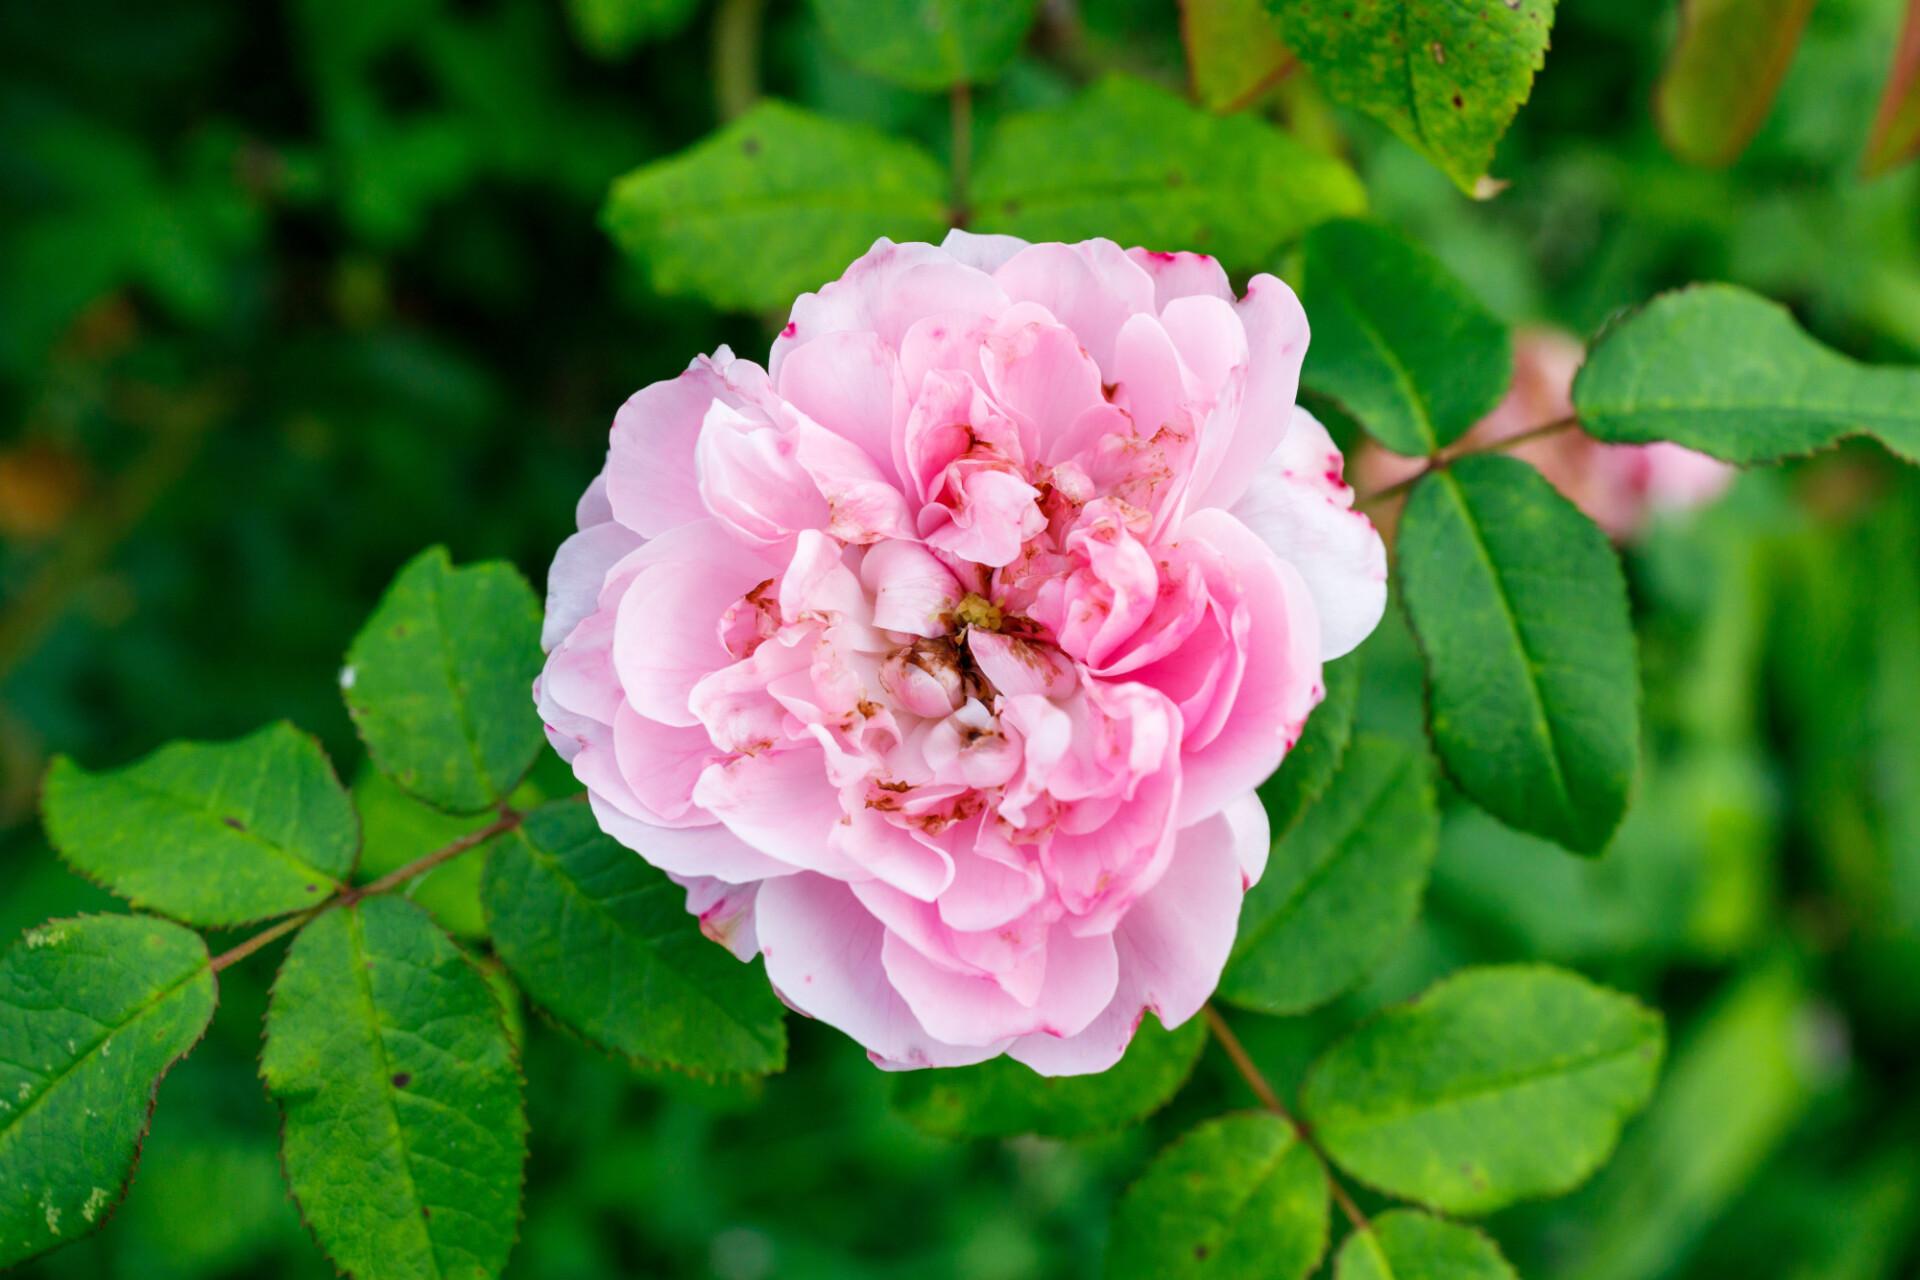 Pink Rose blooms in September